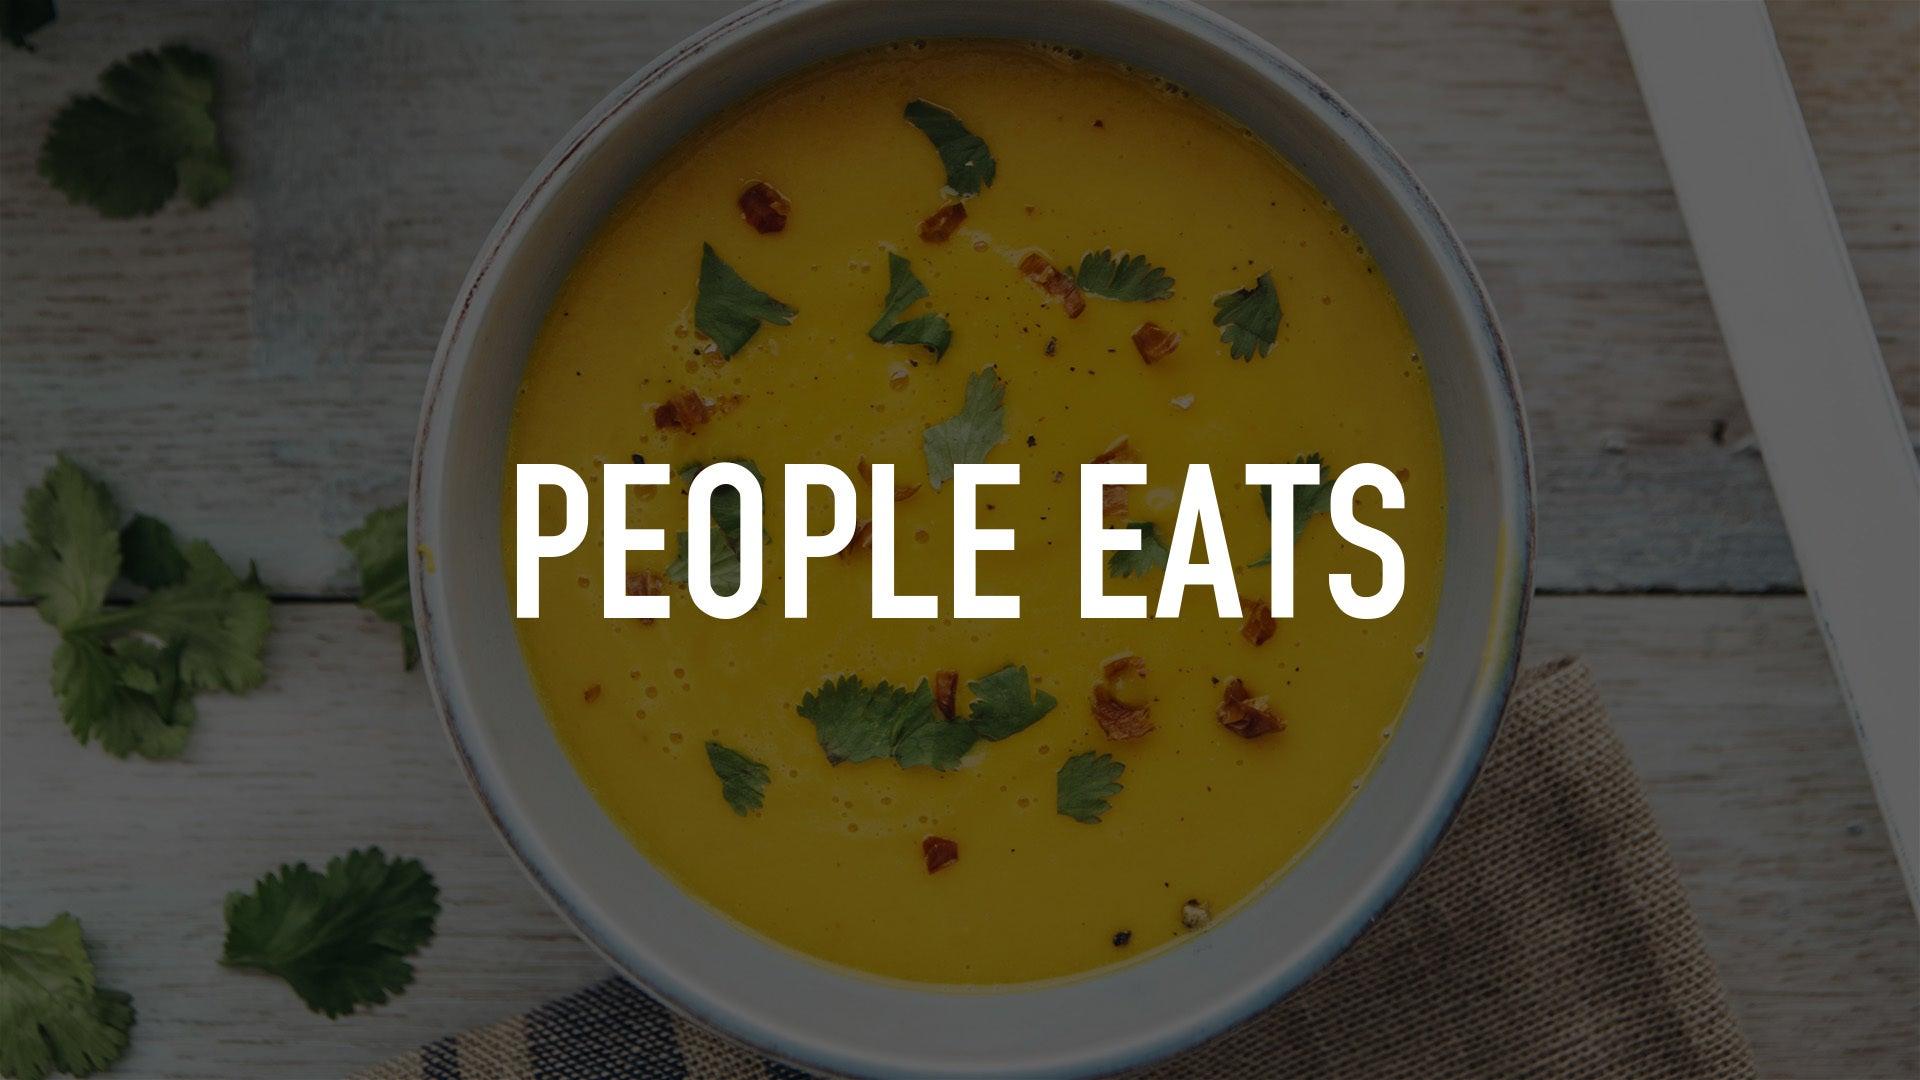 People Eats